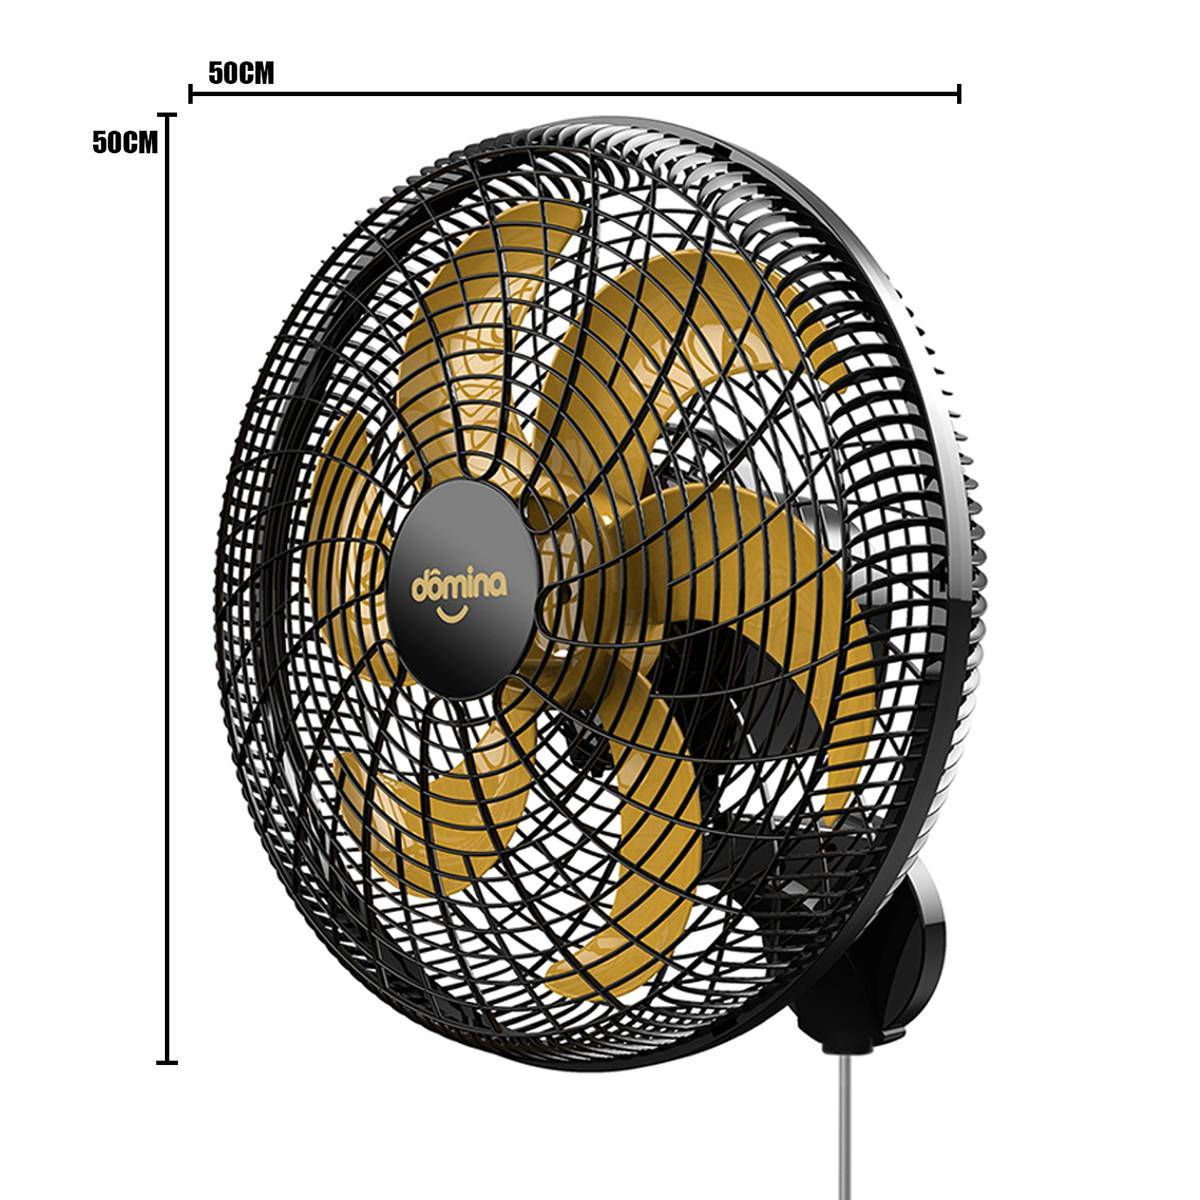 Ventilador De Parede Turbo 6 Pás 50cm Preto/Dourado Domina C - LCGELETRO